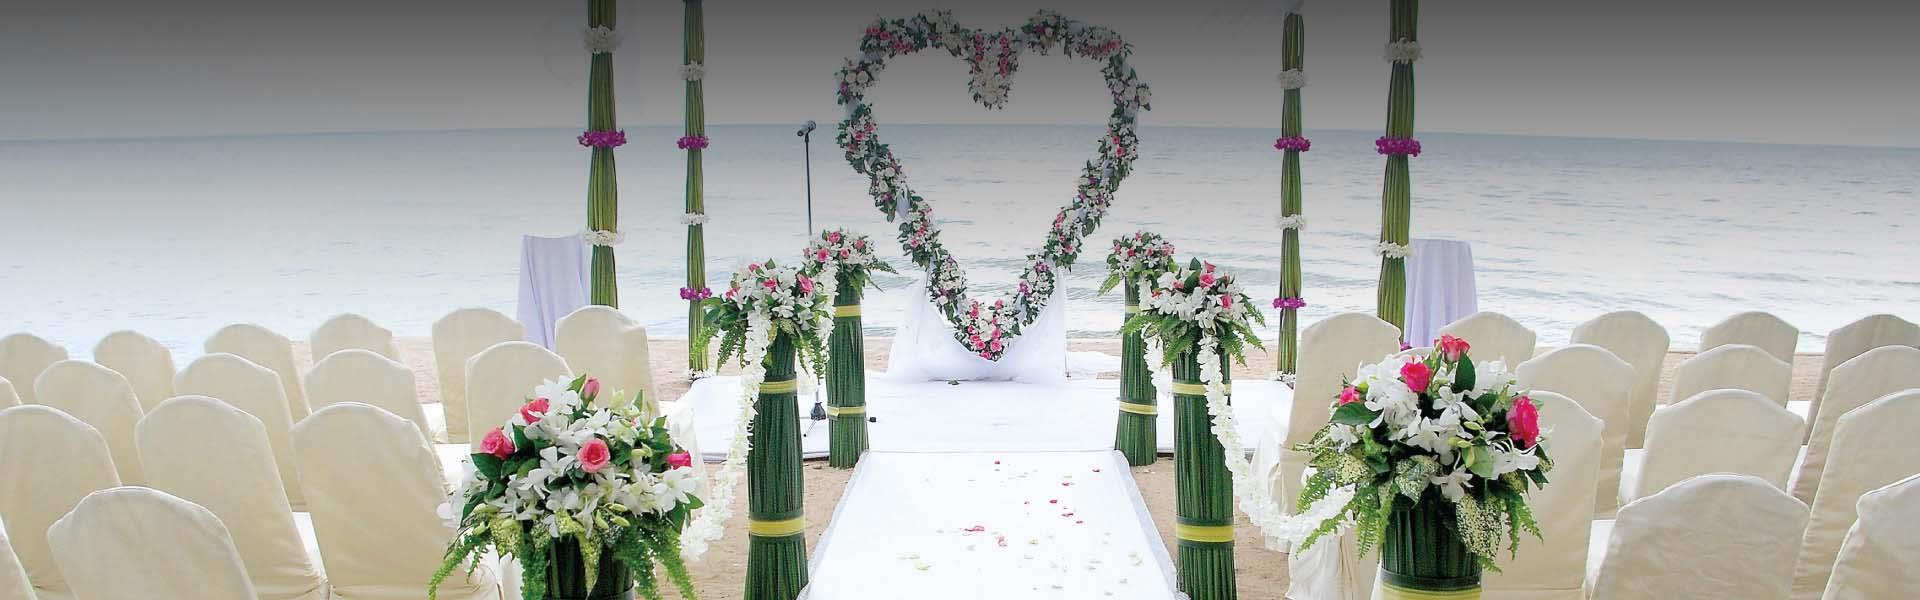 Hua Hin Wedding Package Anantara Hua Hin Wedding Venues